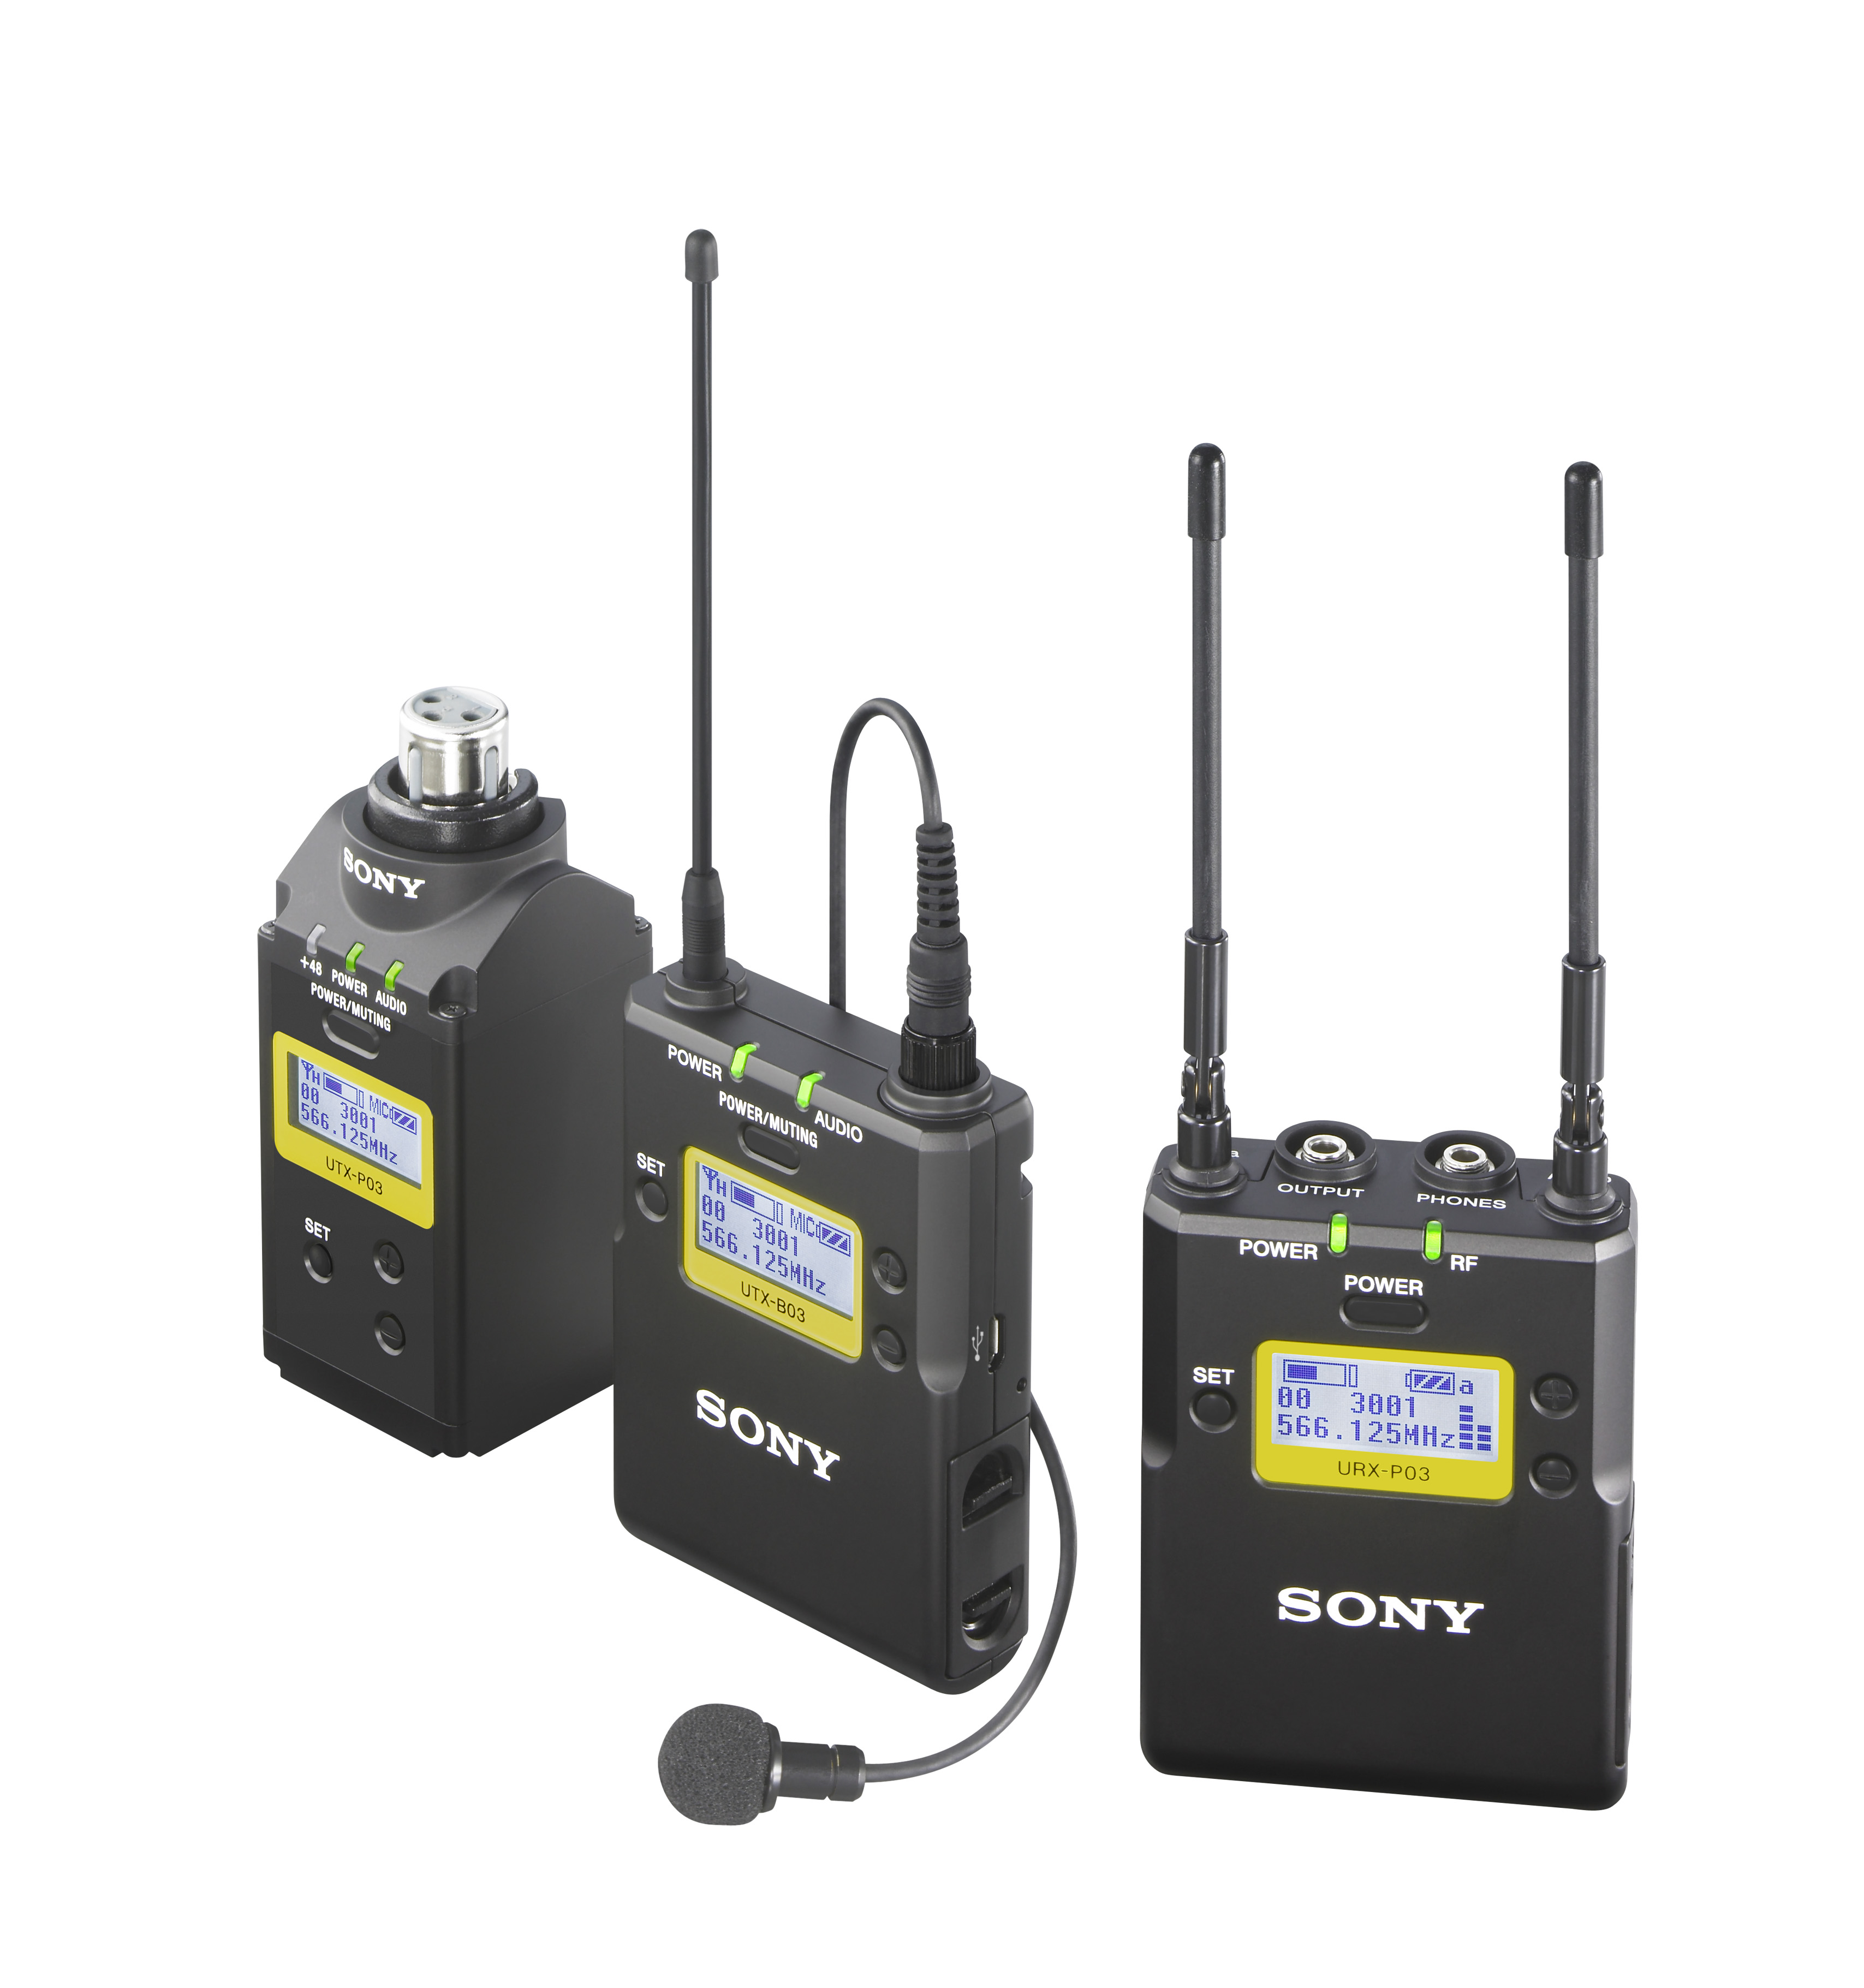 Sony UWP-D16/K33 belt pack and plug on wireless set